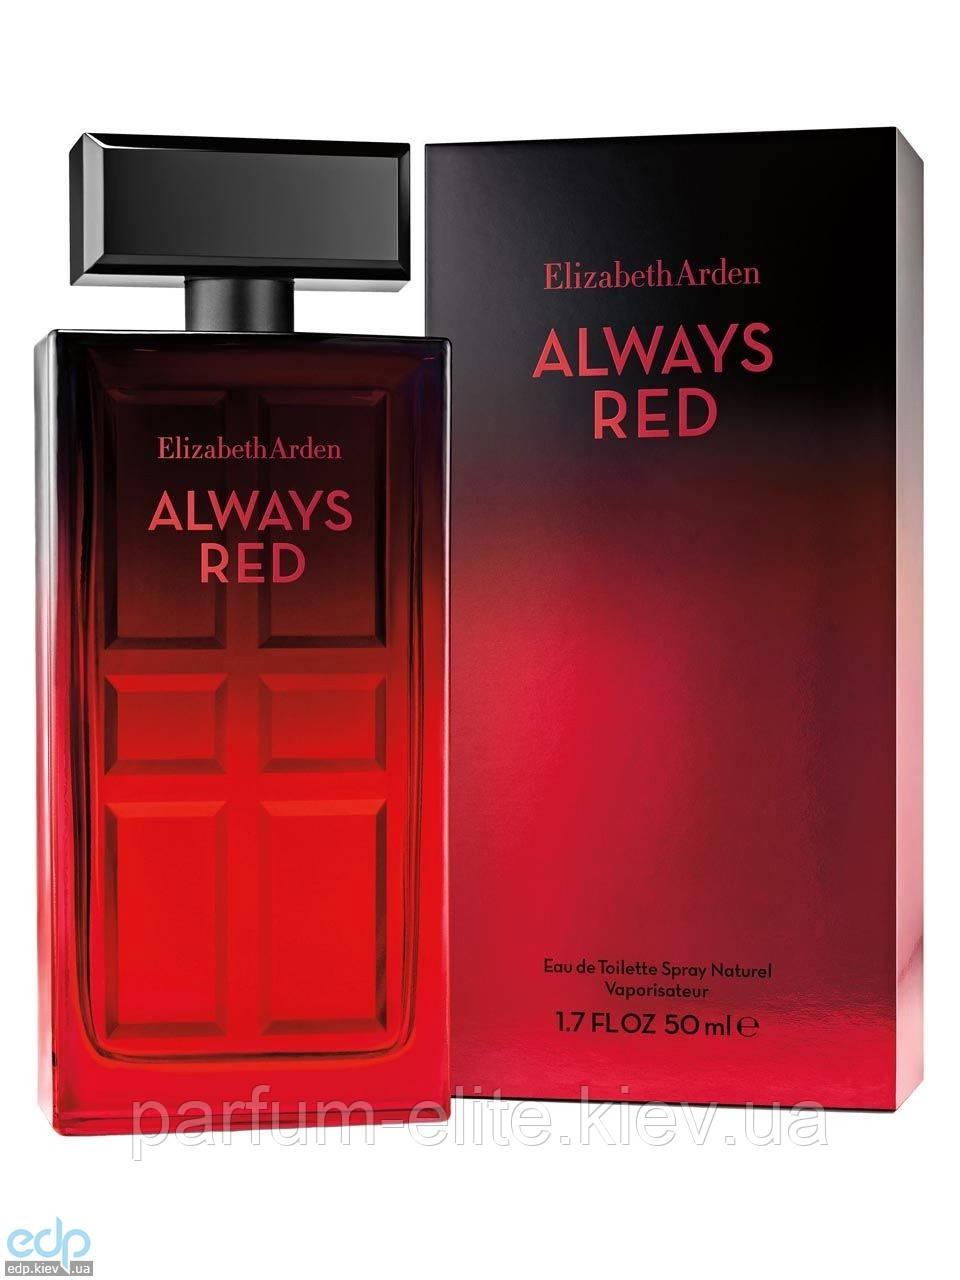 Жіноча туалетна вода Elizabeth Arden Always Red 30ml